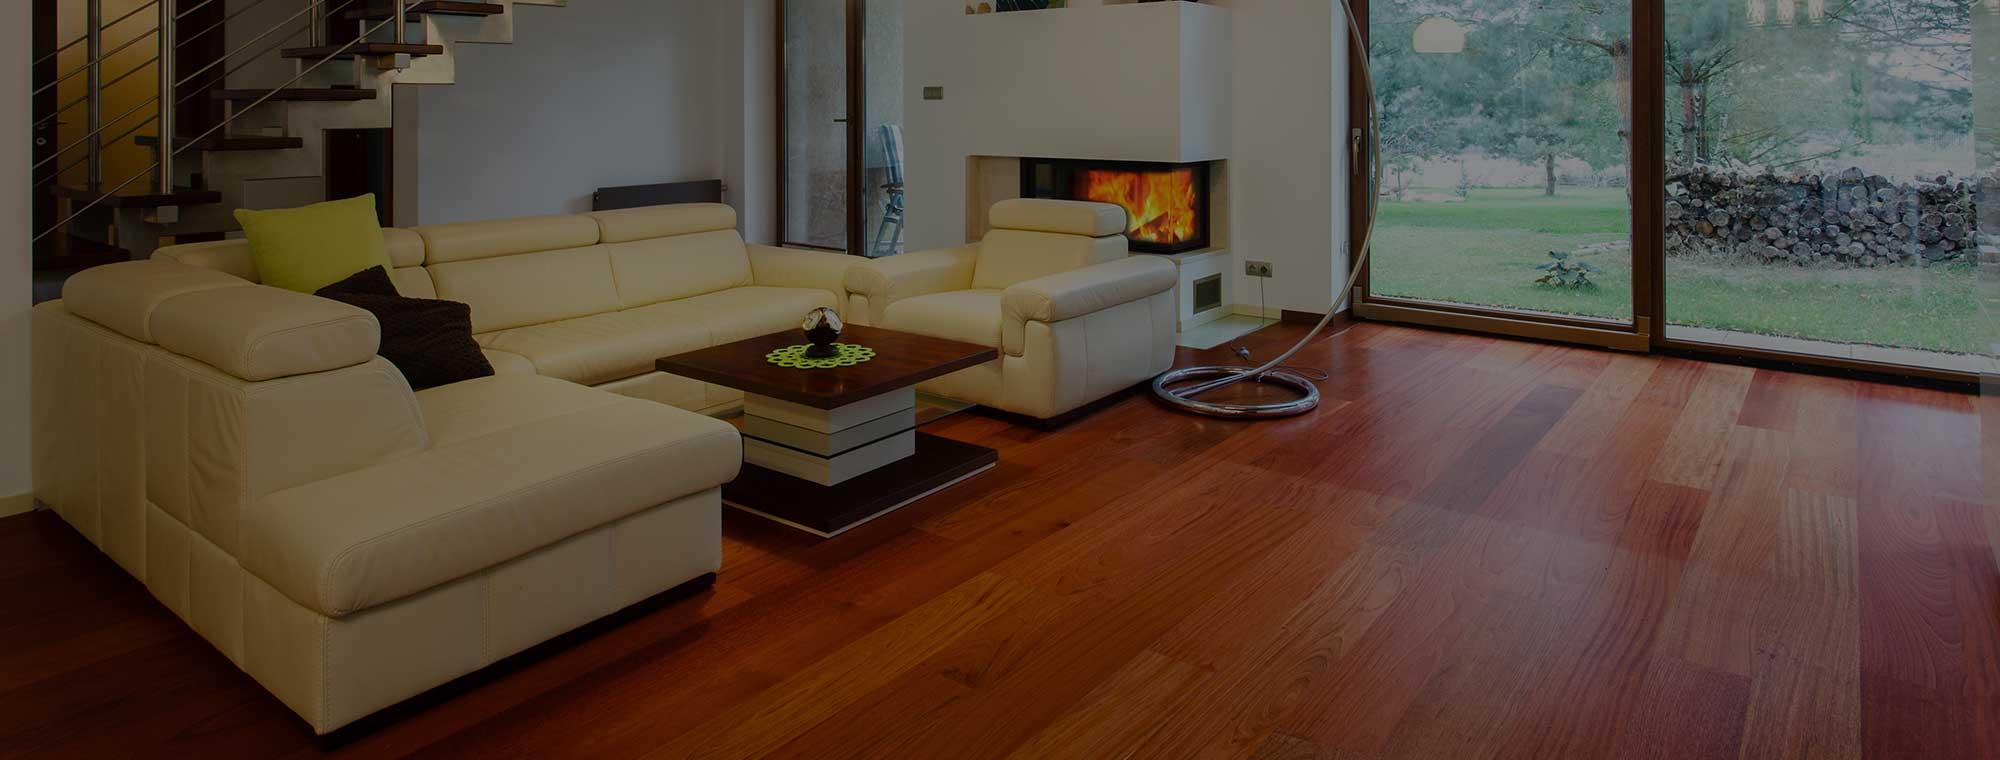 Elegancia y Naturaleza para tu hogar